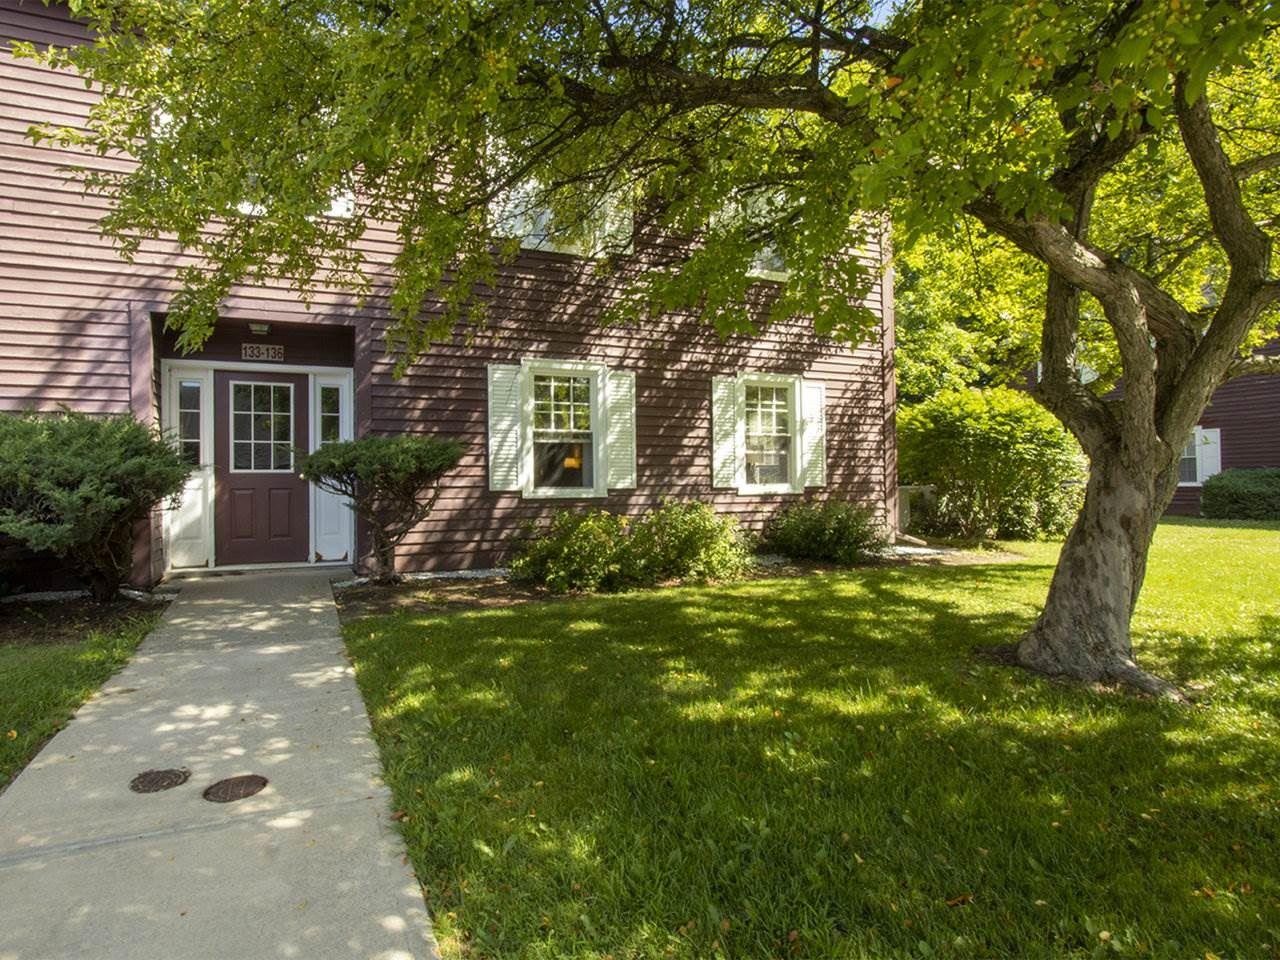 133 North Twin Oaks Terrace, South Burlington, VT 05403 - MLS#: 4820590